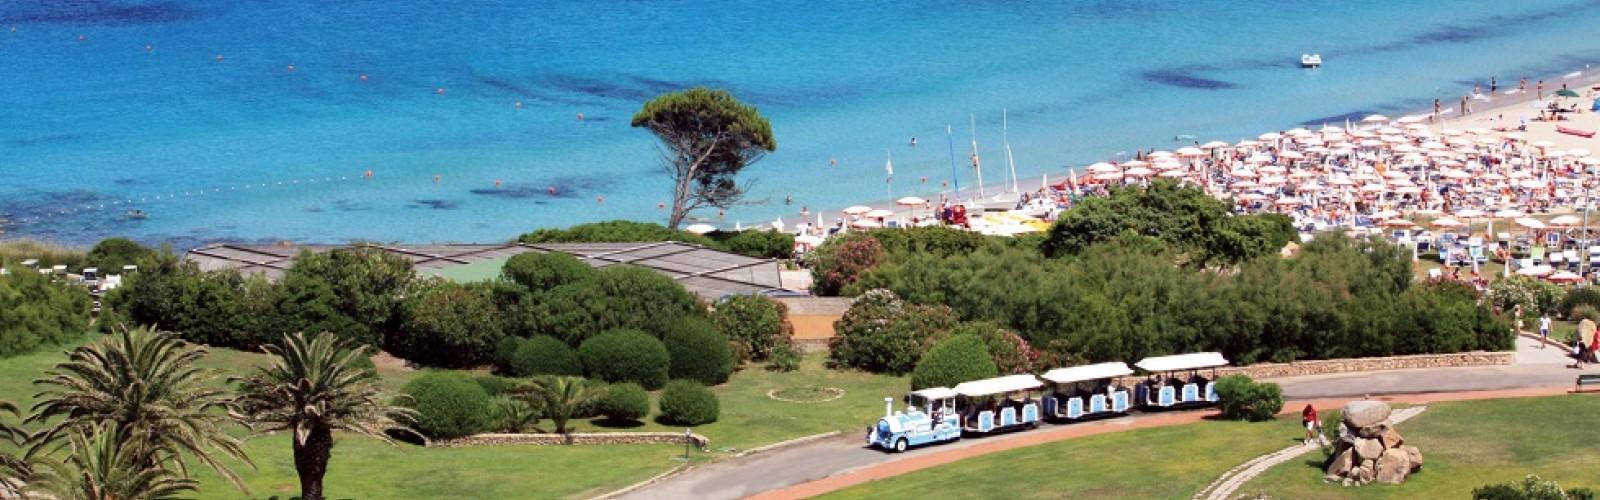 Marmorata Village - Santa Teresa Gallura, Sardegna